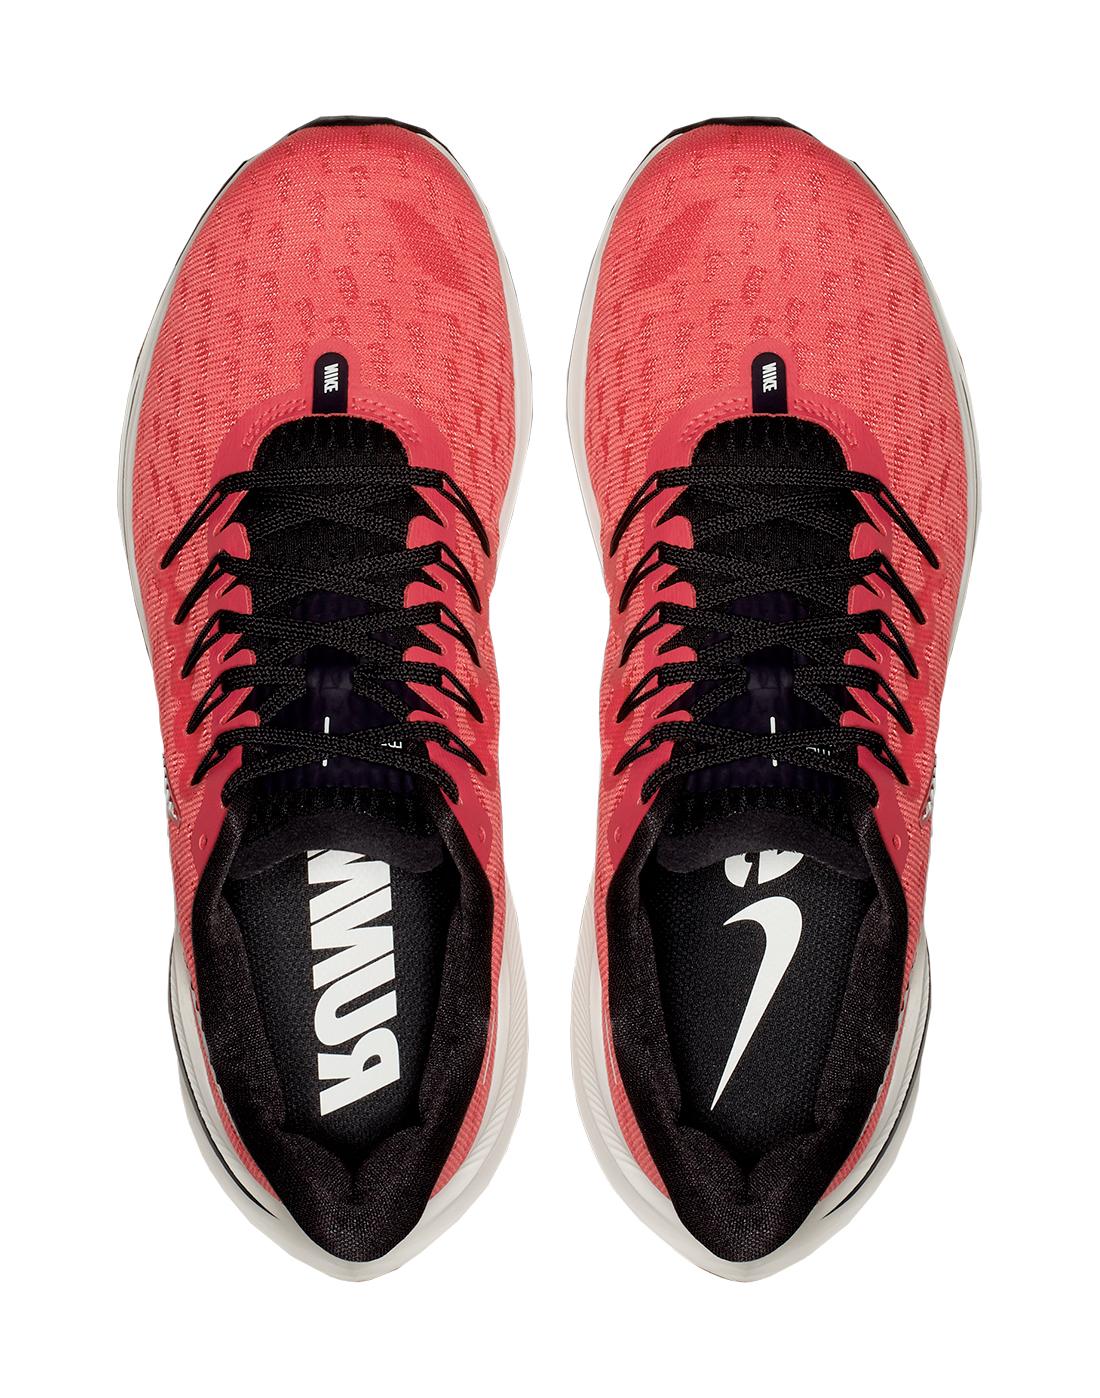 9409b0e62ebc Women s Red Nike Air Zoom Vomero 14